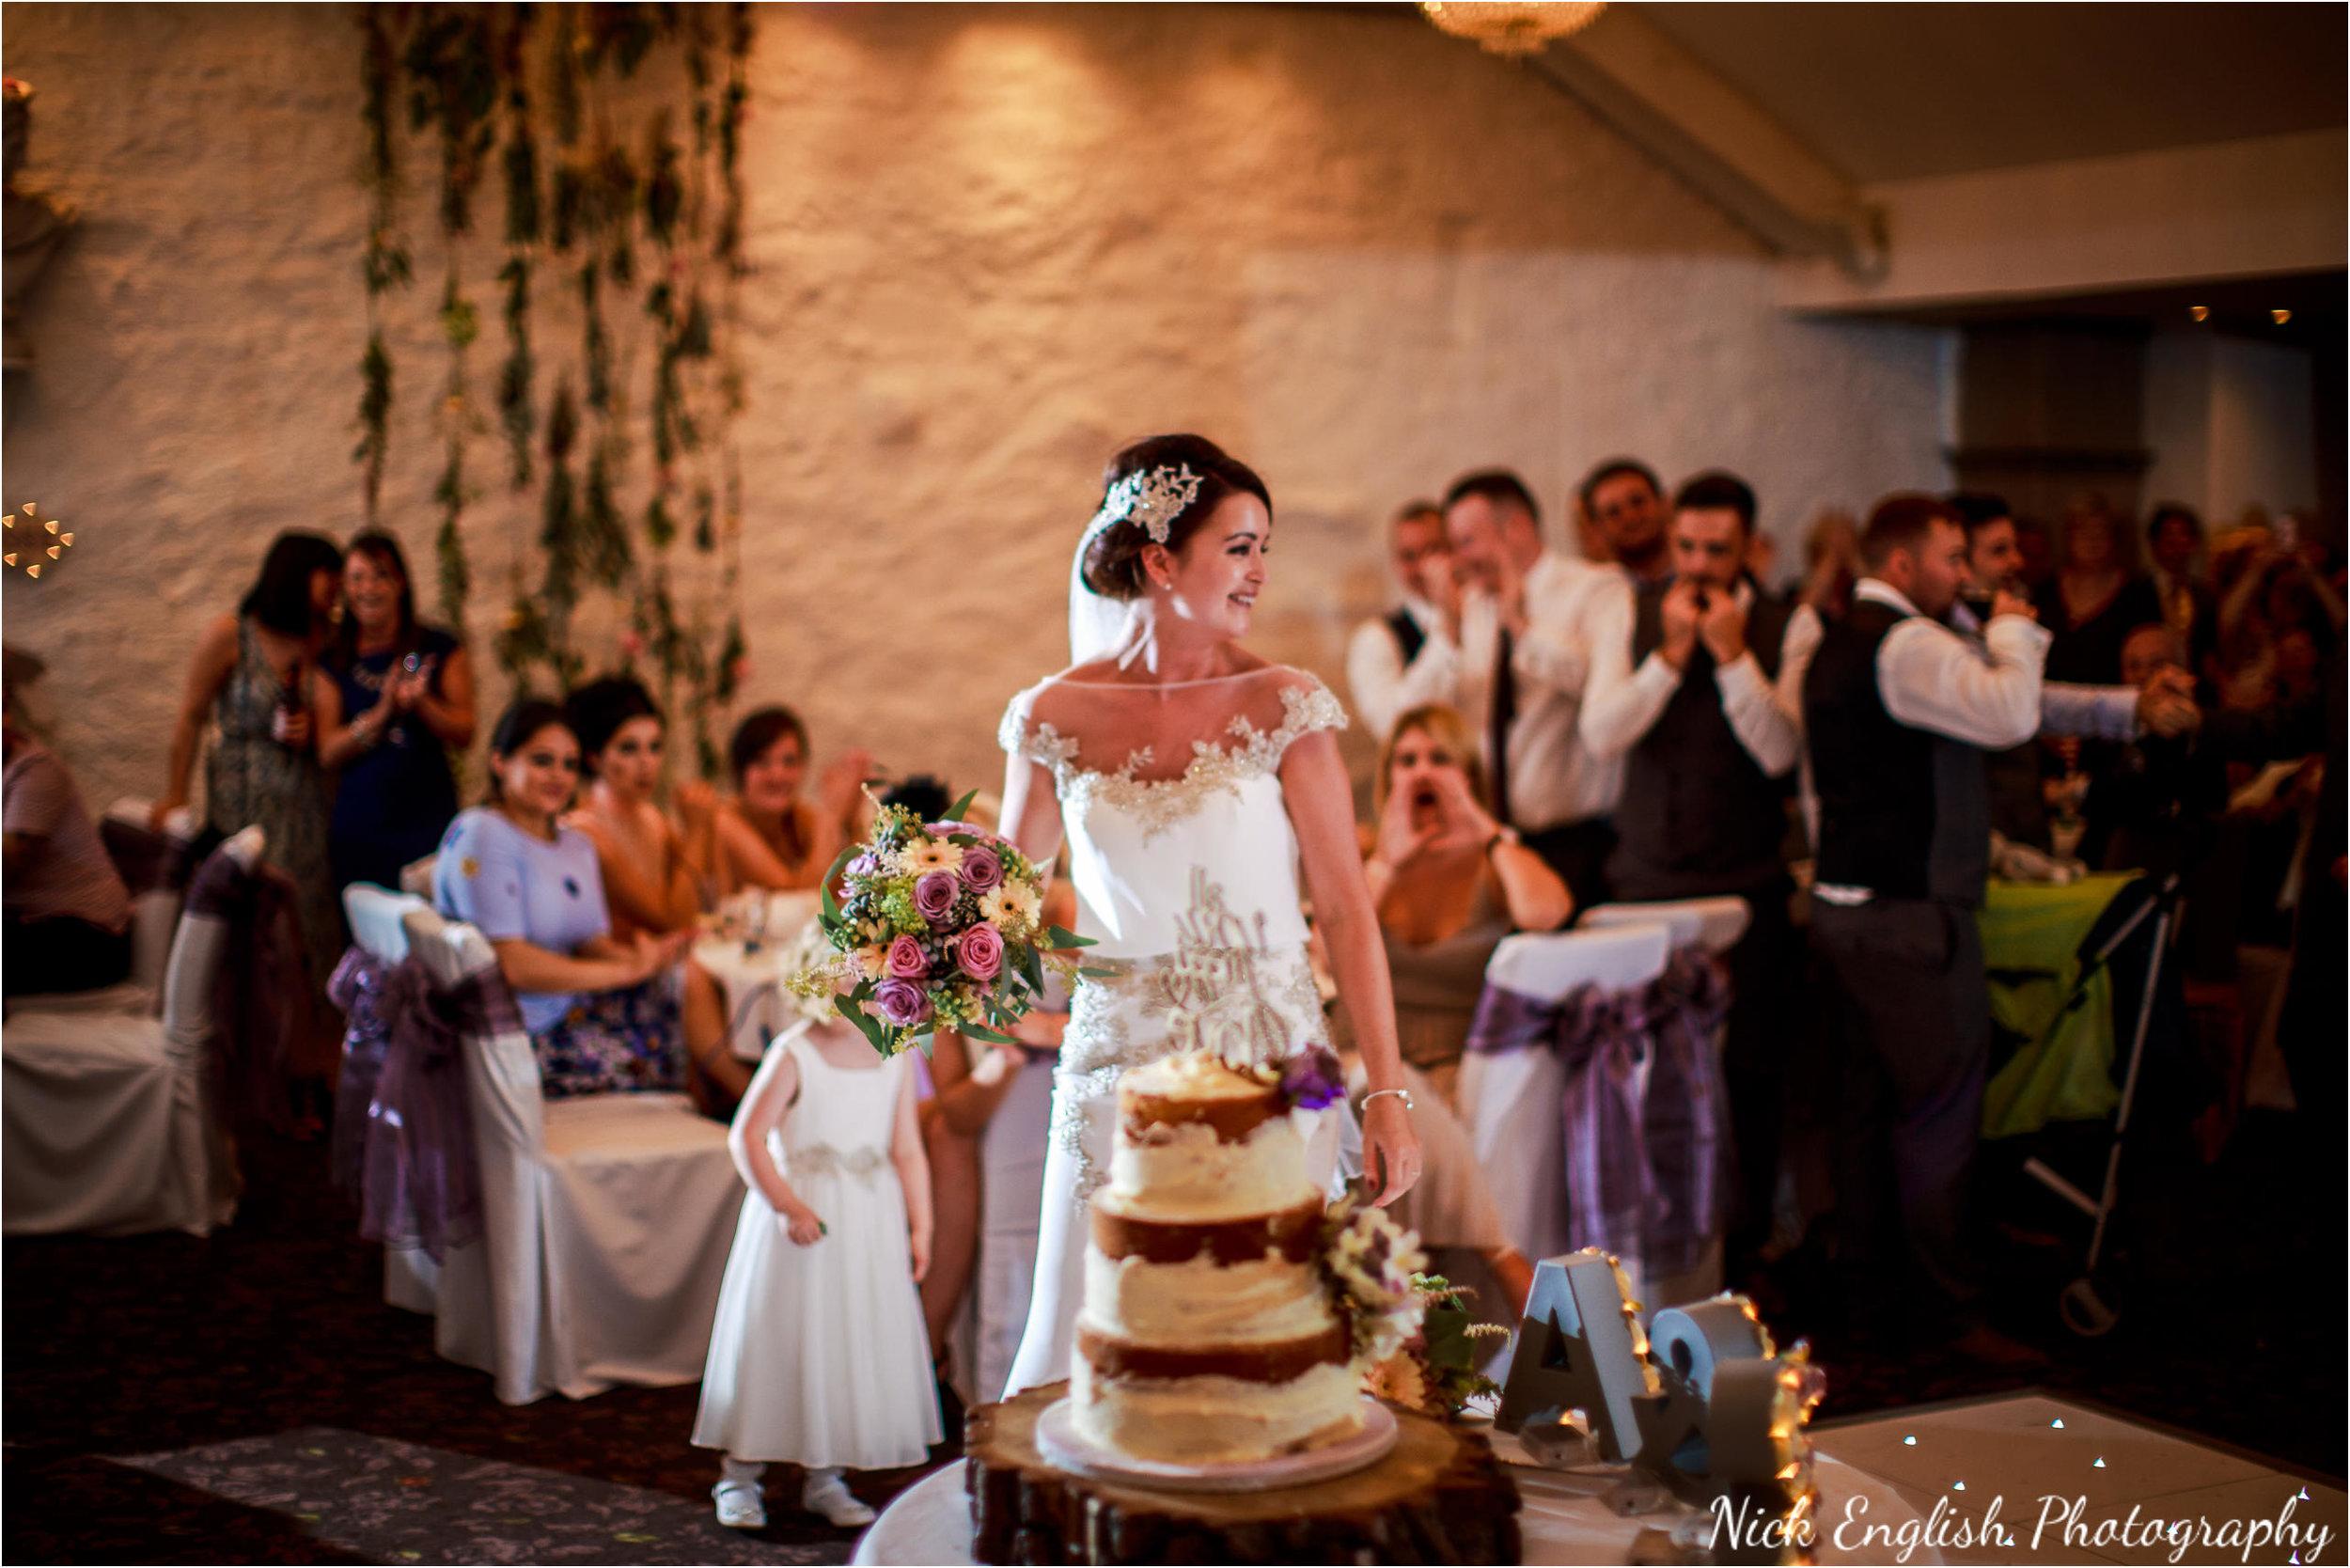 Stacey-Ash-Wedding-Photographs-Stanley-House-Preston-Lancashire-238.jpg